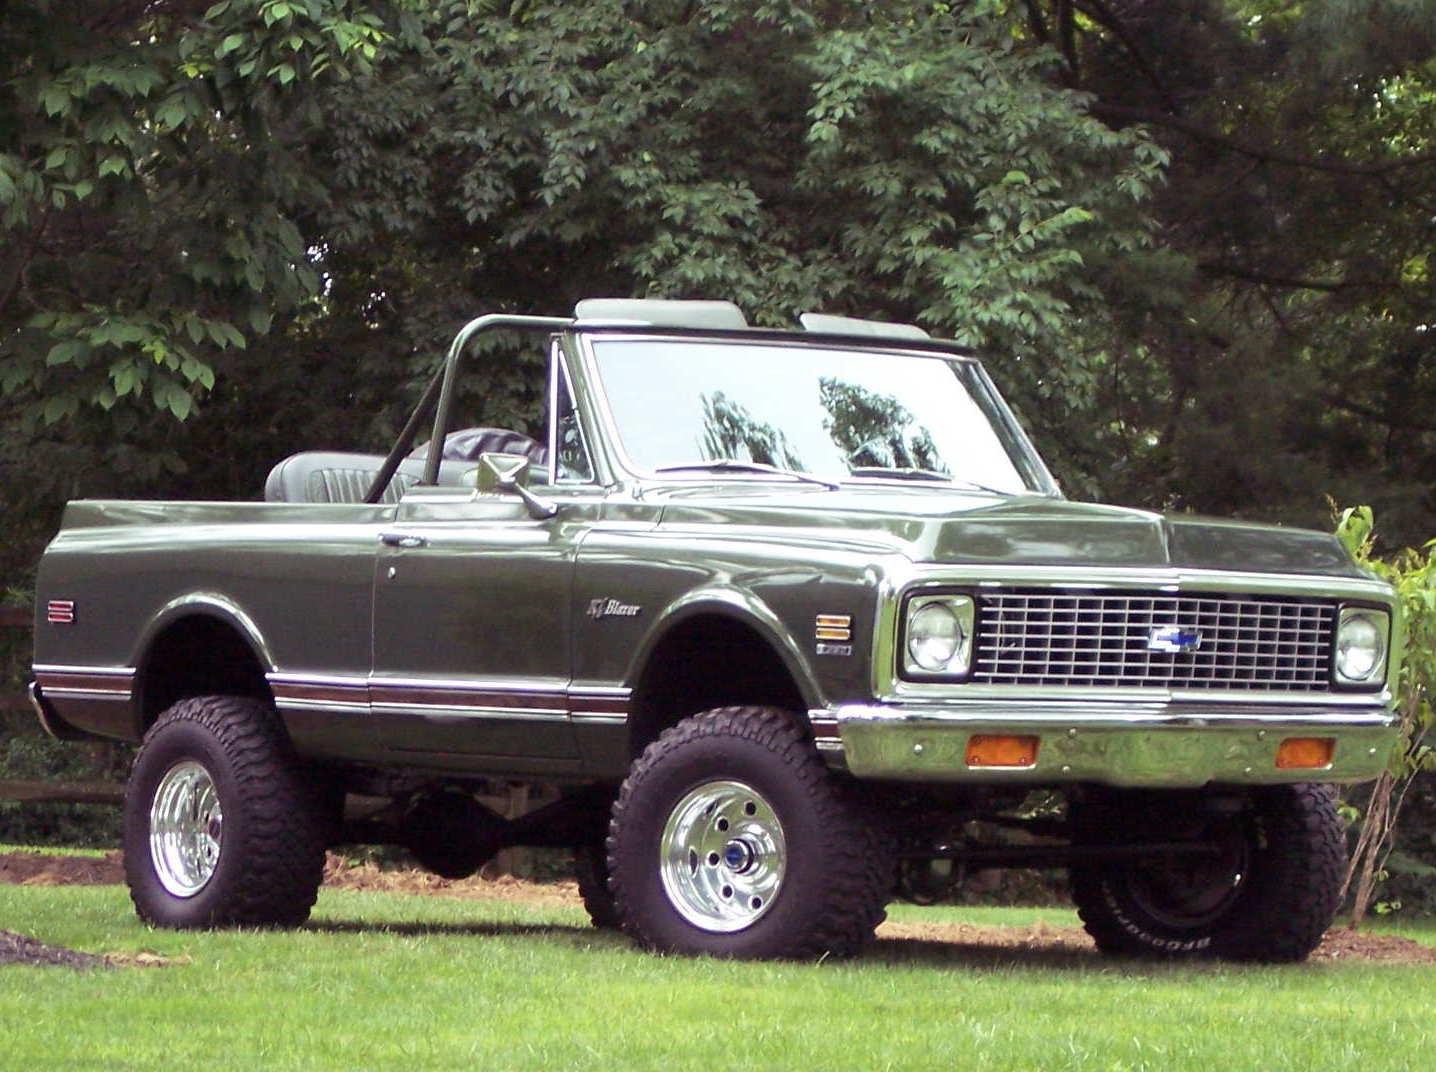 1969 Chevy Blazer For Sale Craigslist Autos Post